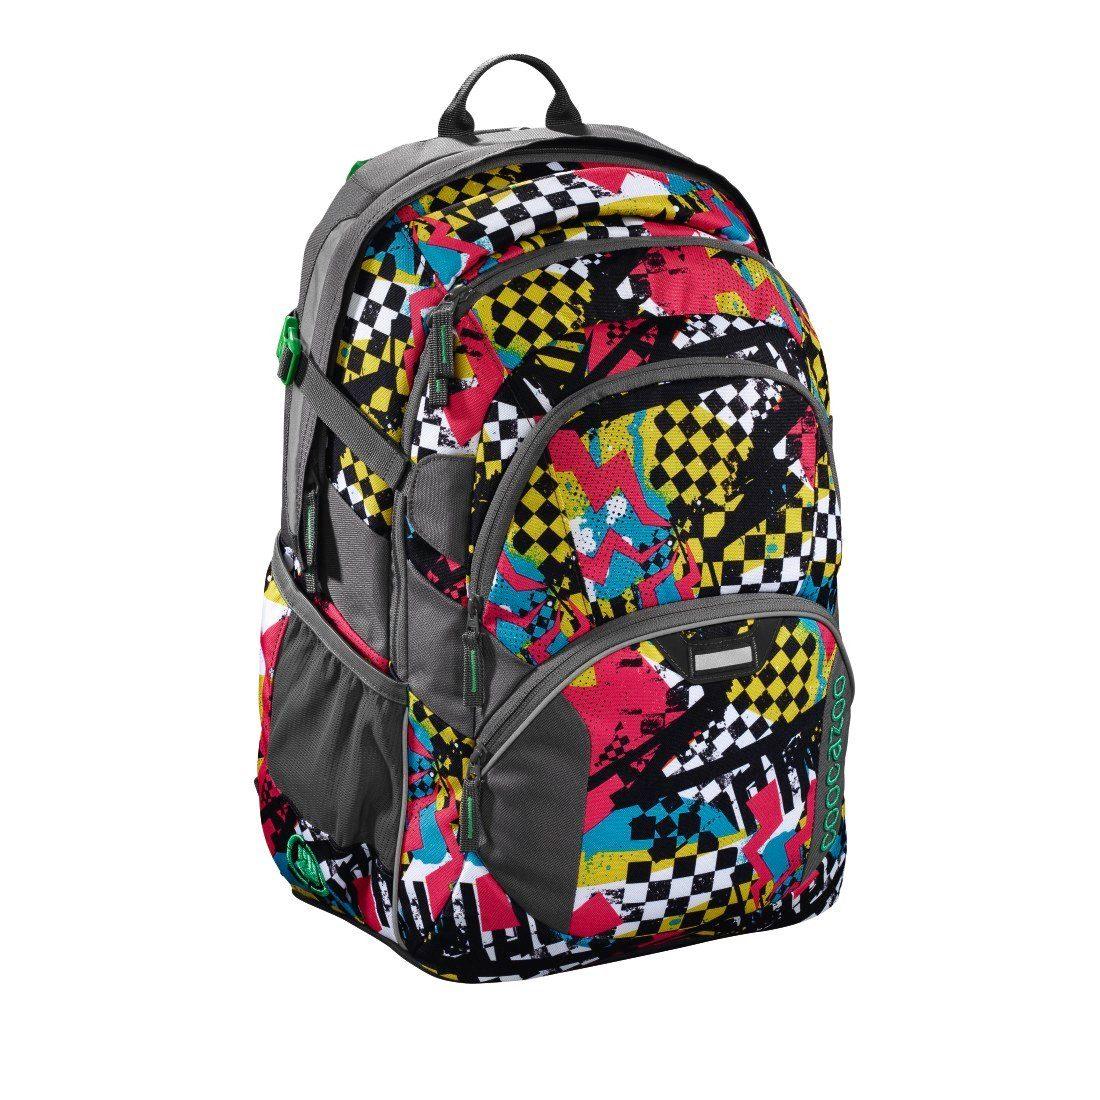 coocazoo Rucksack ´´JobJobber2´´ mit Laptopfach »Checkered Bolts« | Taschen > Rucksäcke > Sonstige Rucksäcke | Bunt | COOCAZOO